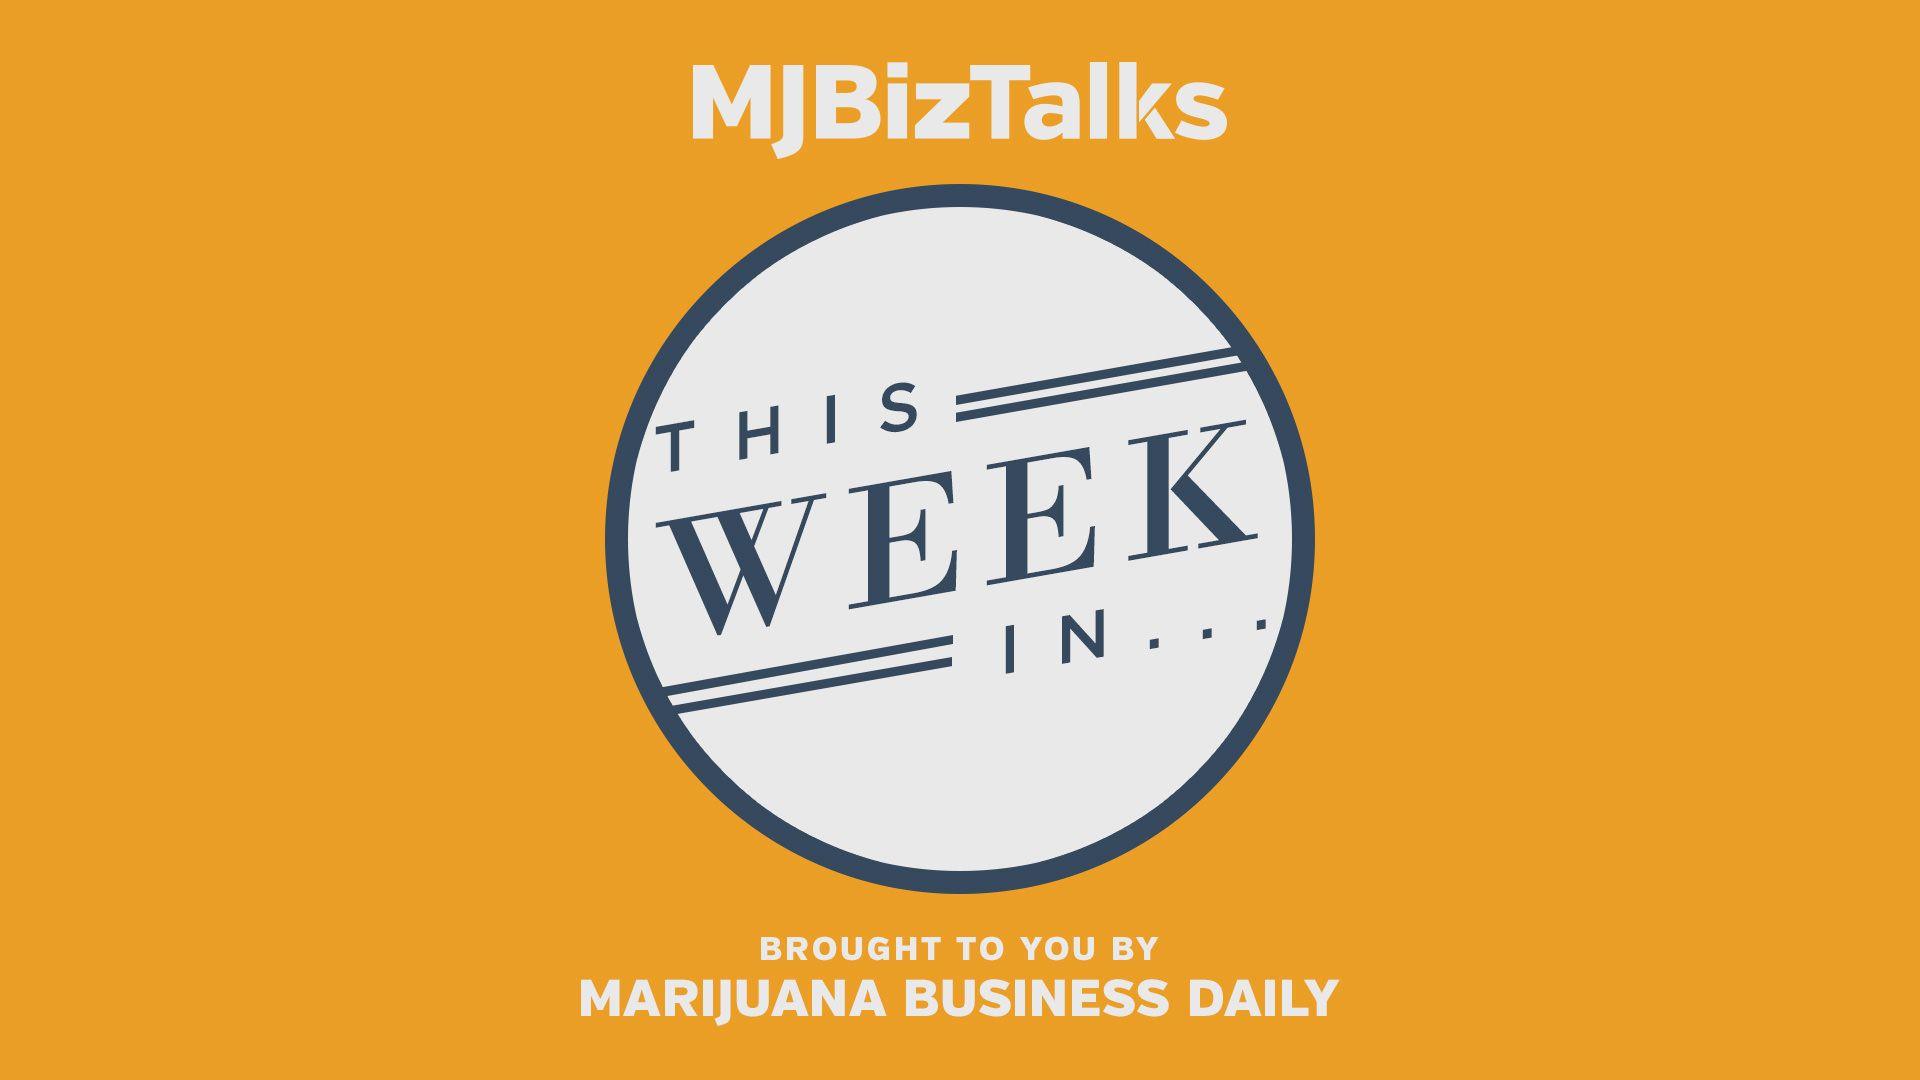 MJBizTalks Podcast - This Week In...